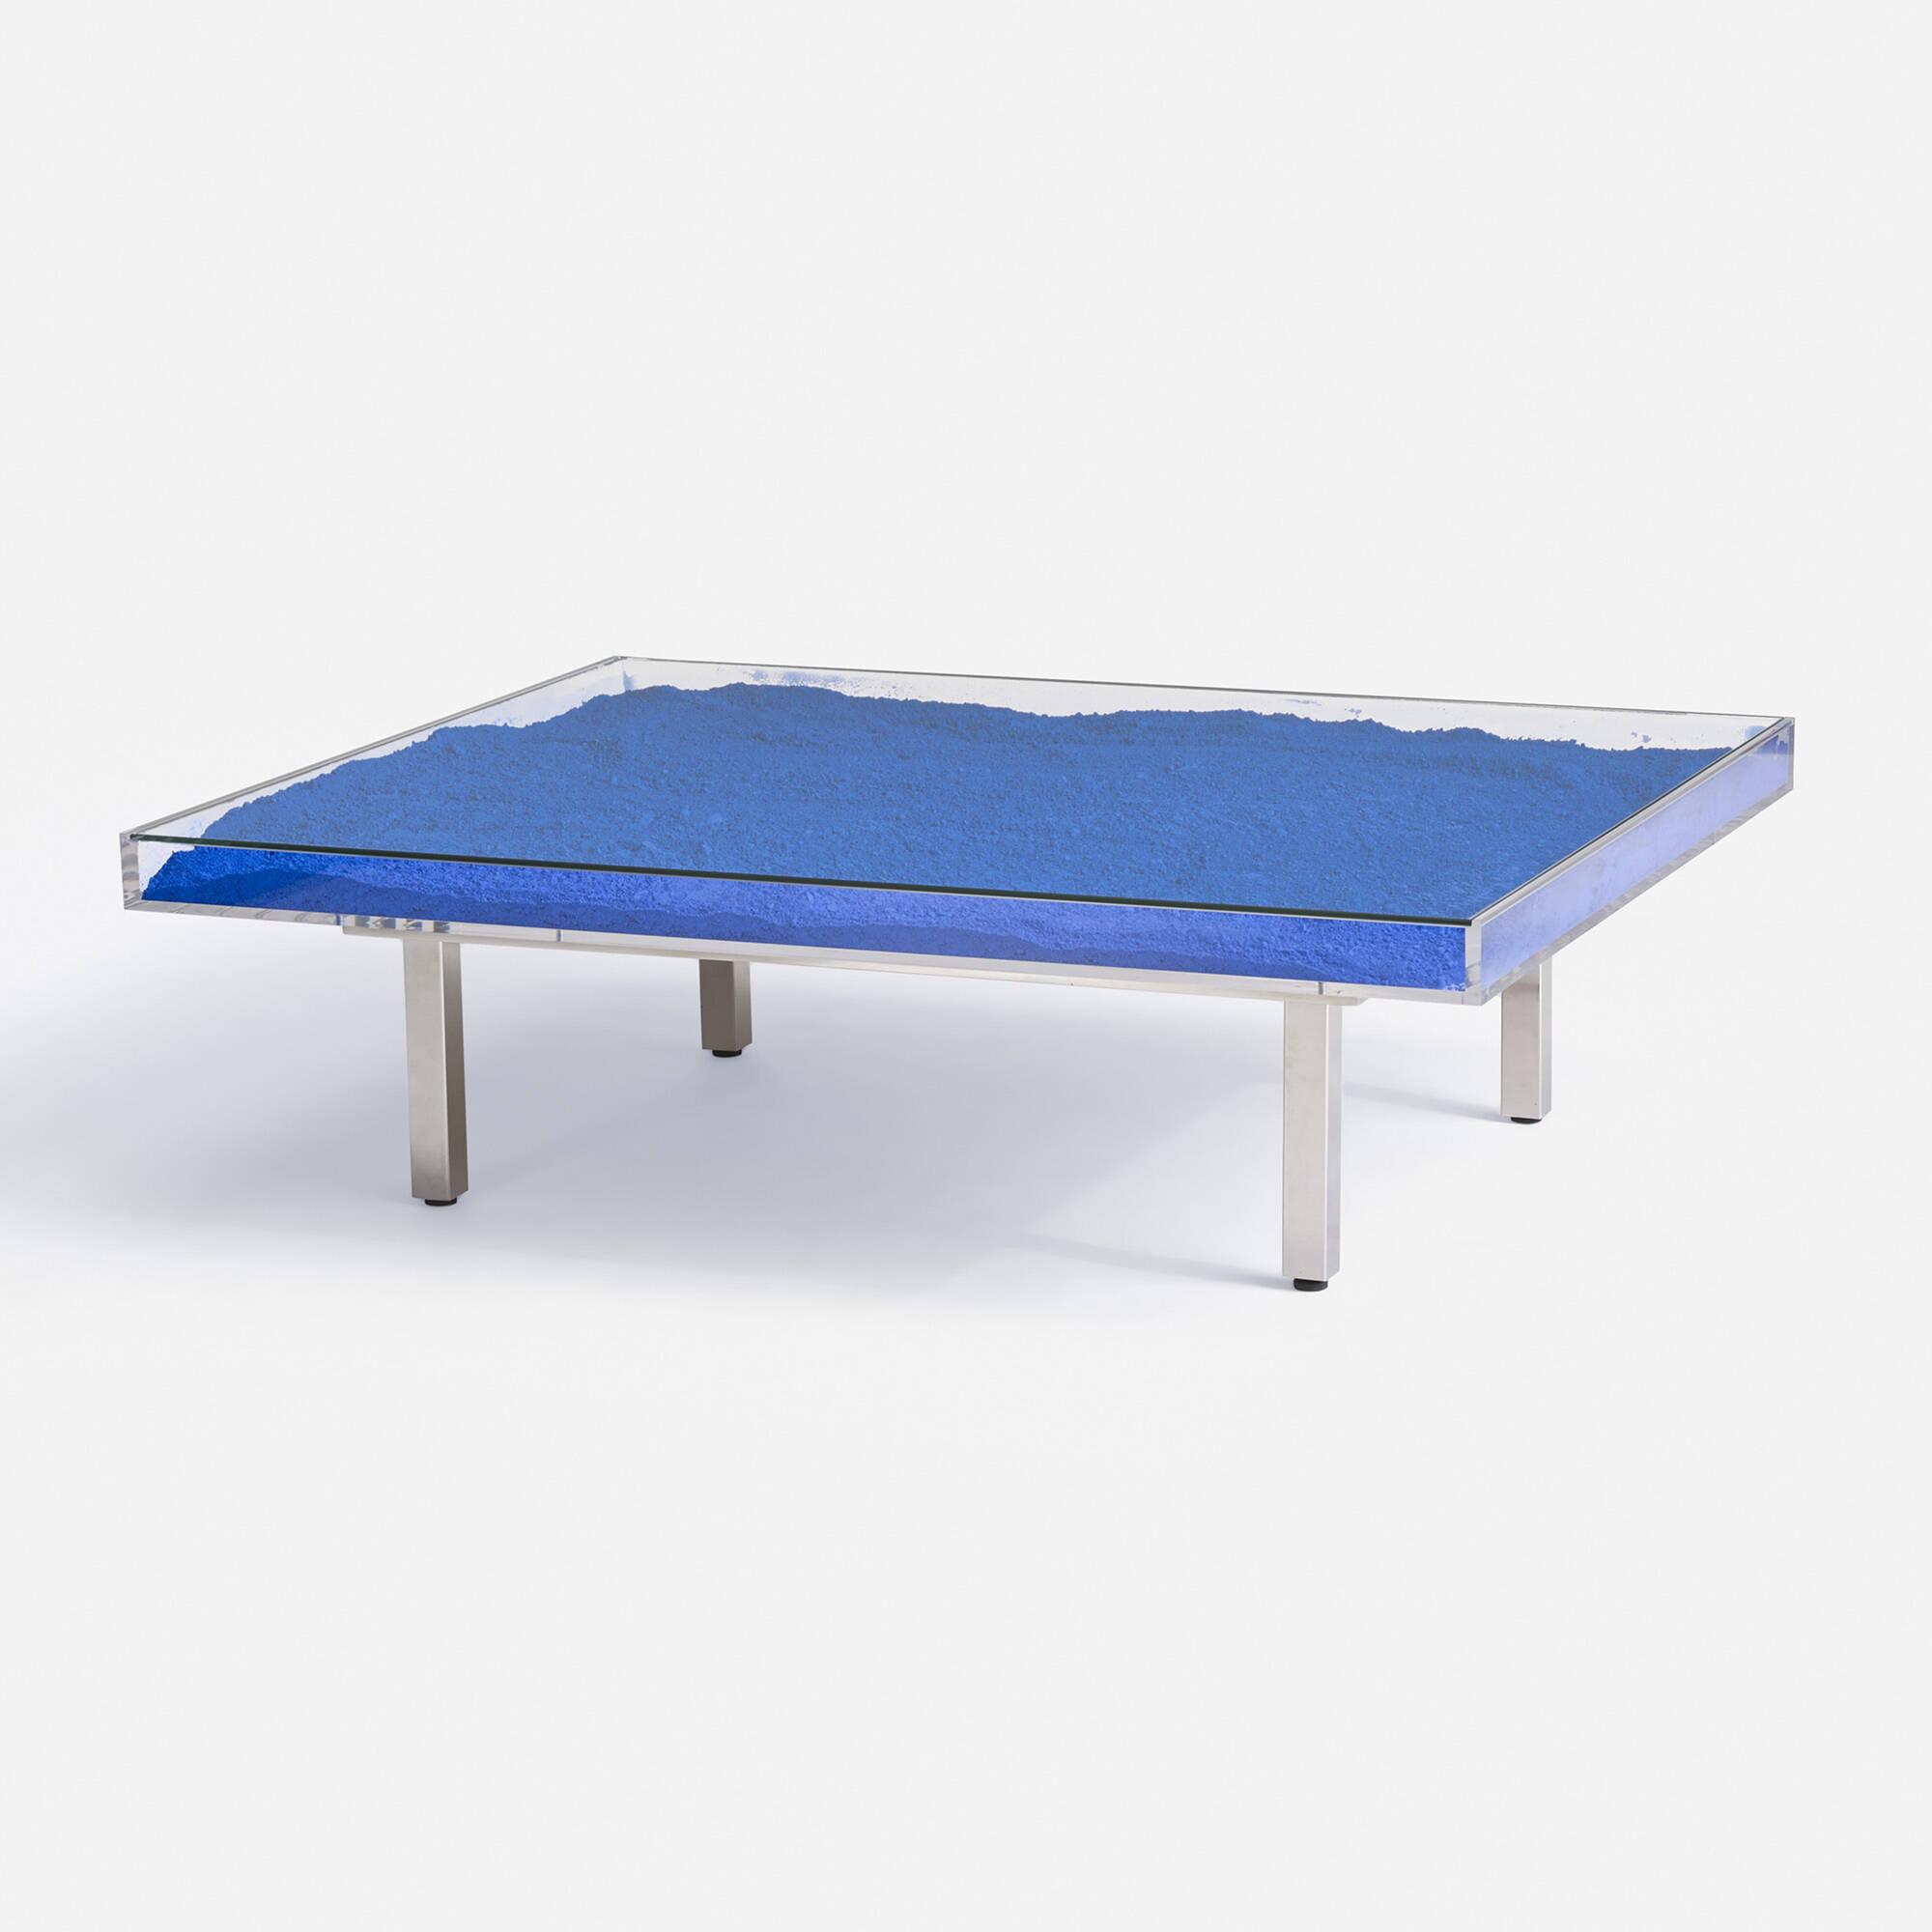 125 yves klein table bleue for Table design 2014